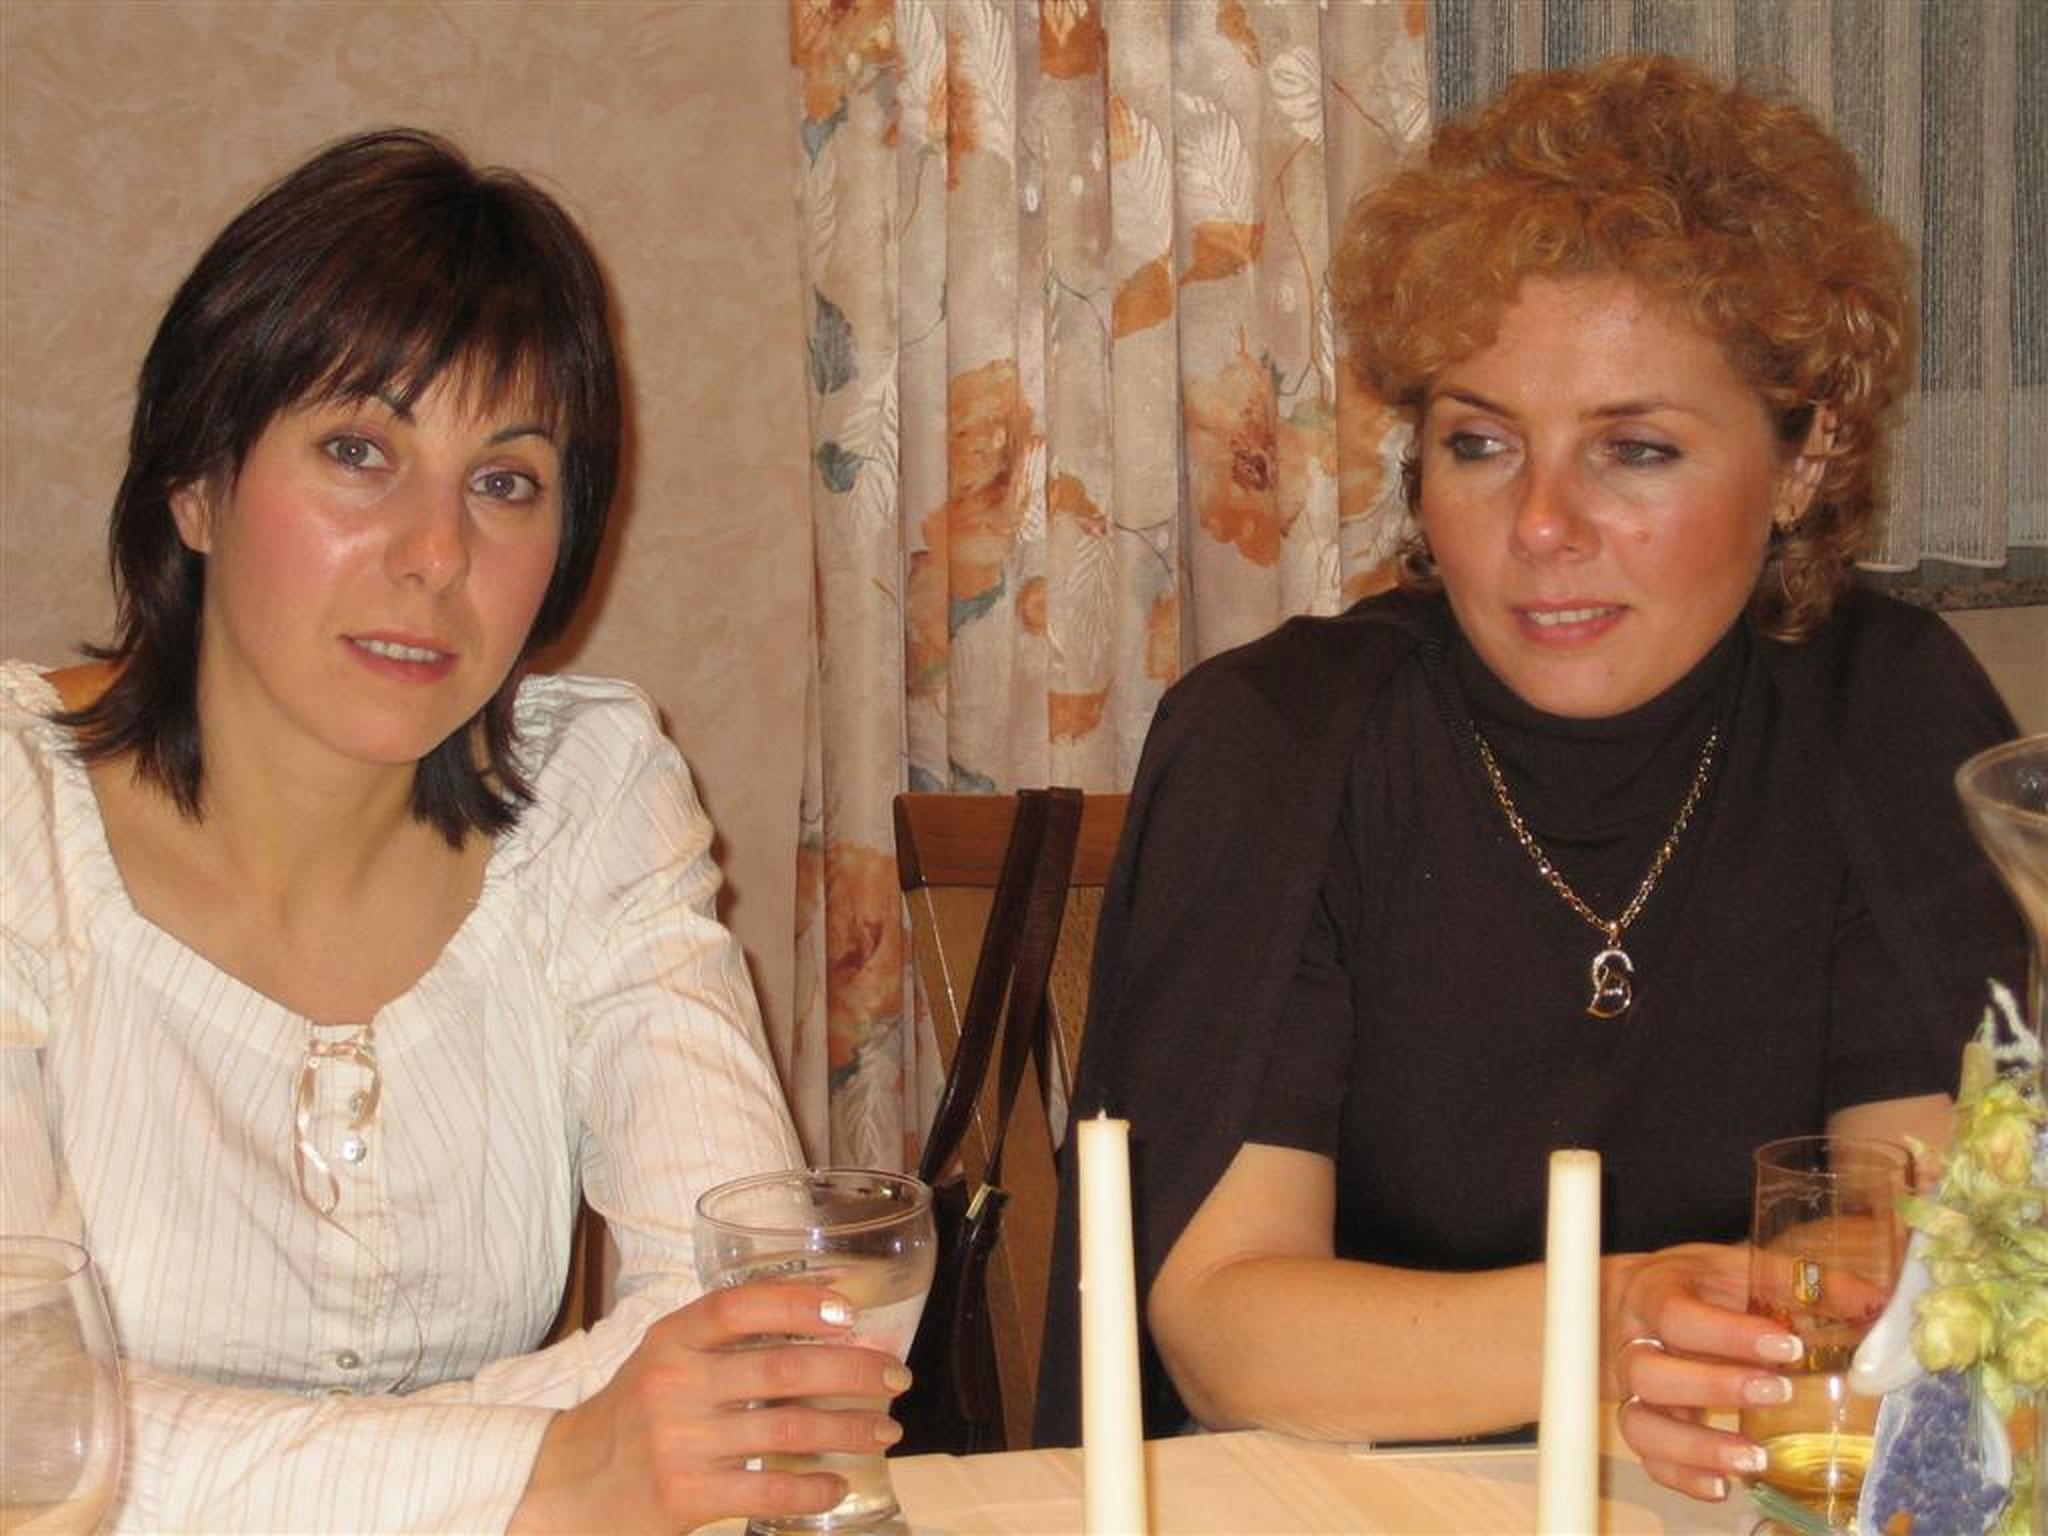 ... Natasha and customer from Moscow 2004